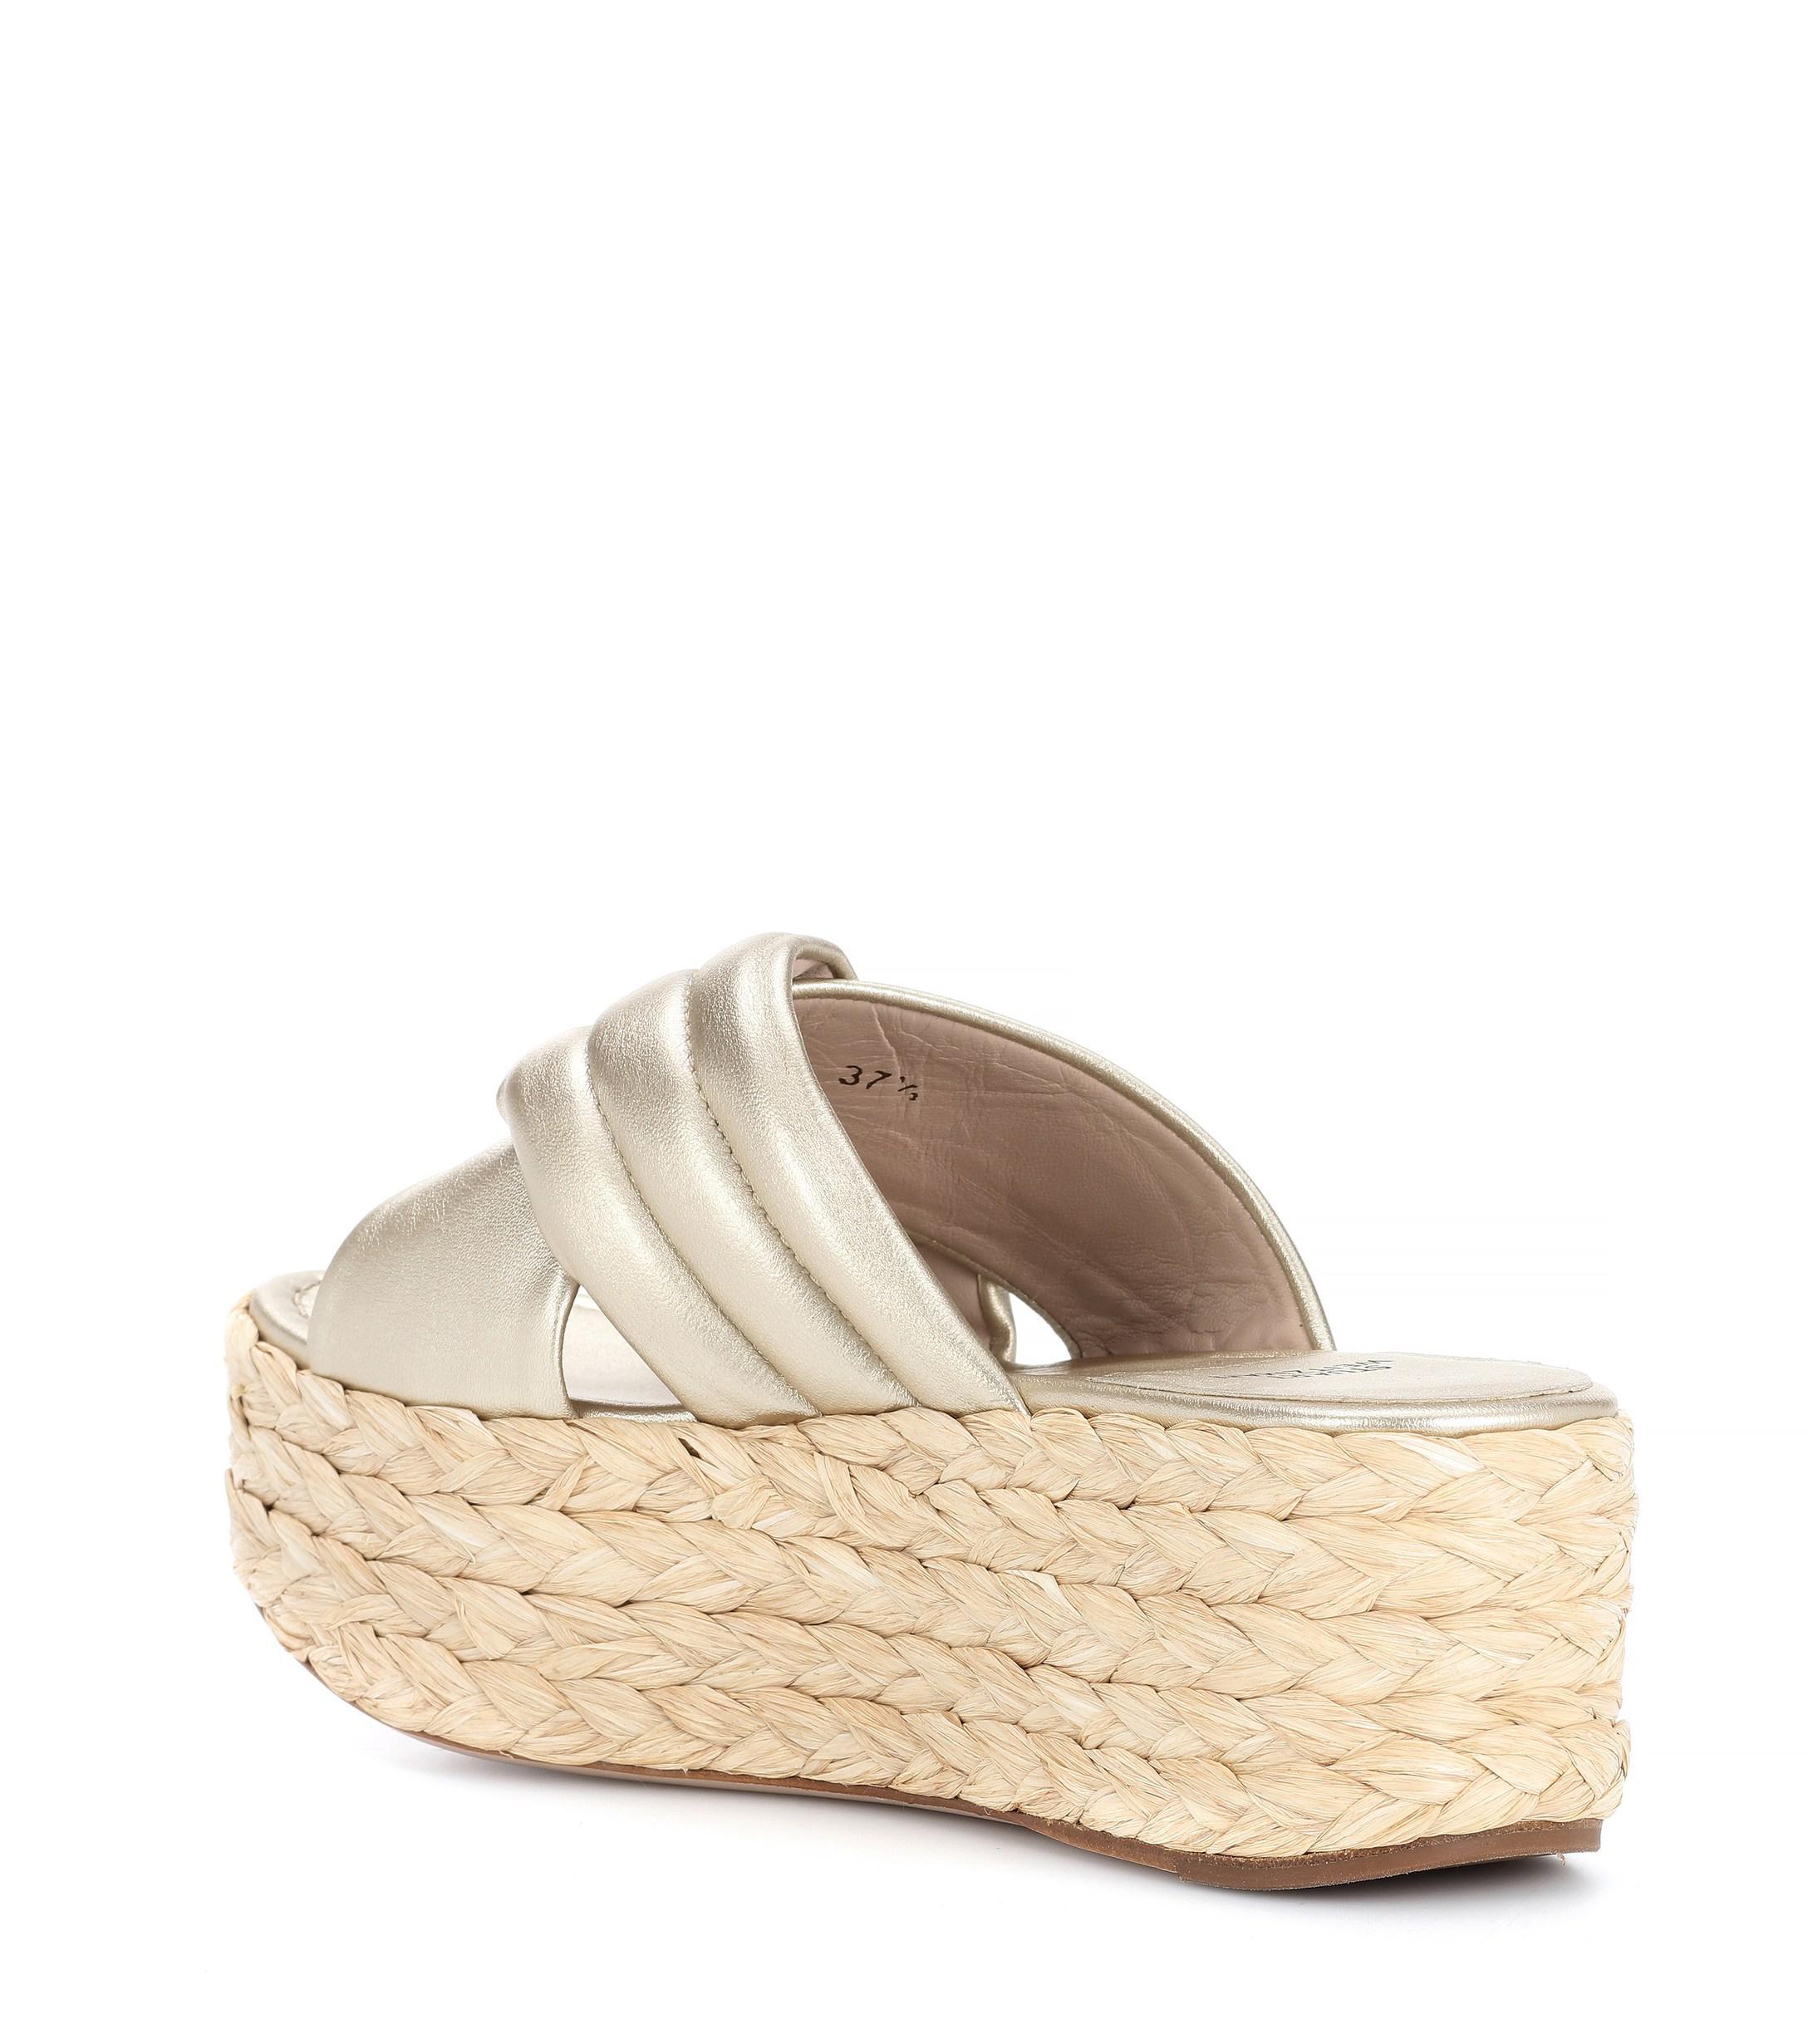 5ae2d815b64 Lyst - Stuart Weitzman Pufftopraffia Leather Platform Sandals in ...